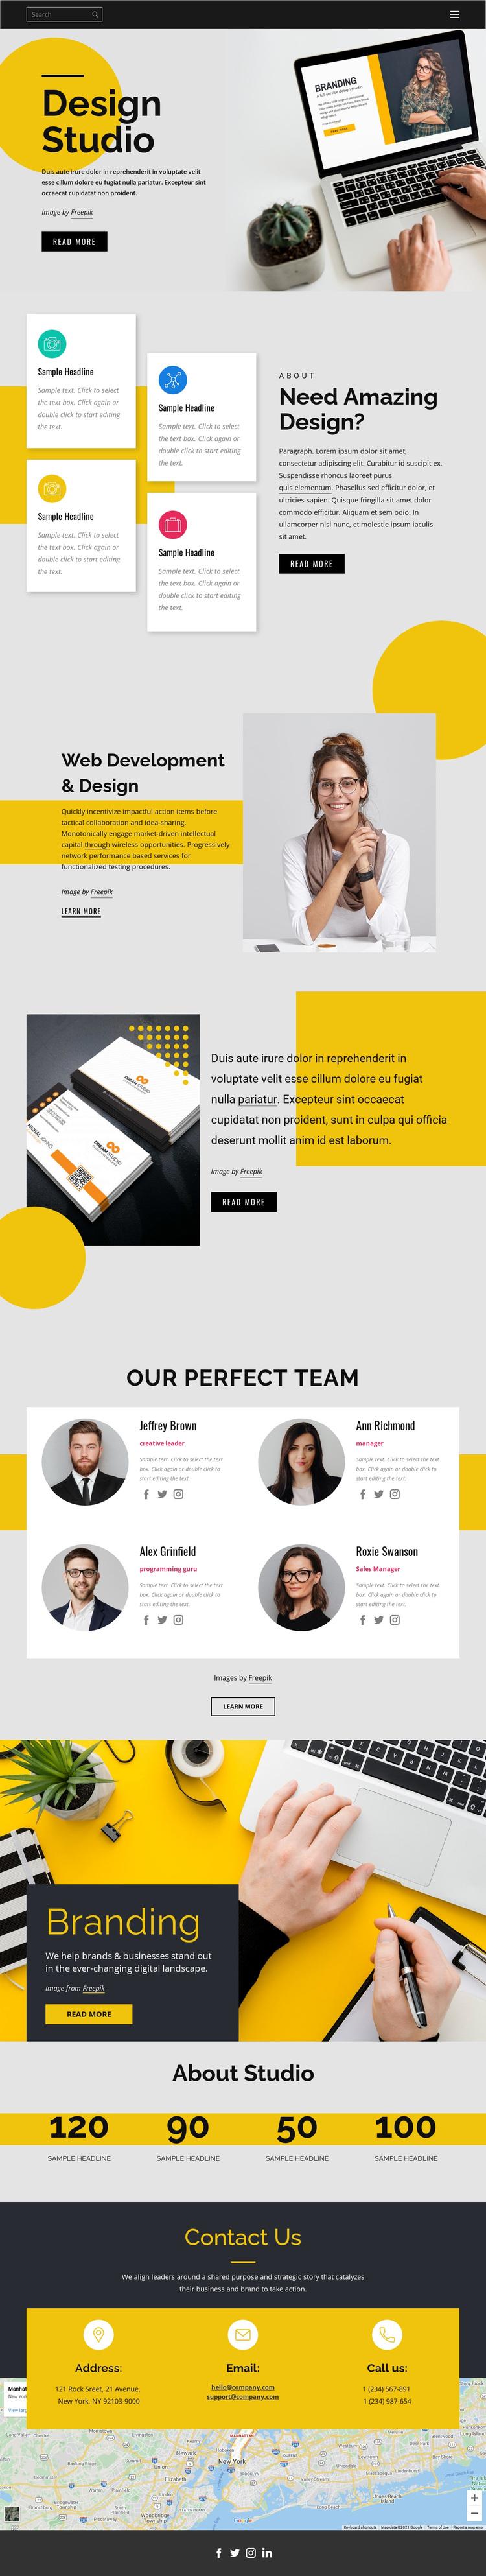 Brand, print & web design Joomla Page Builder